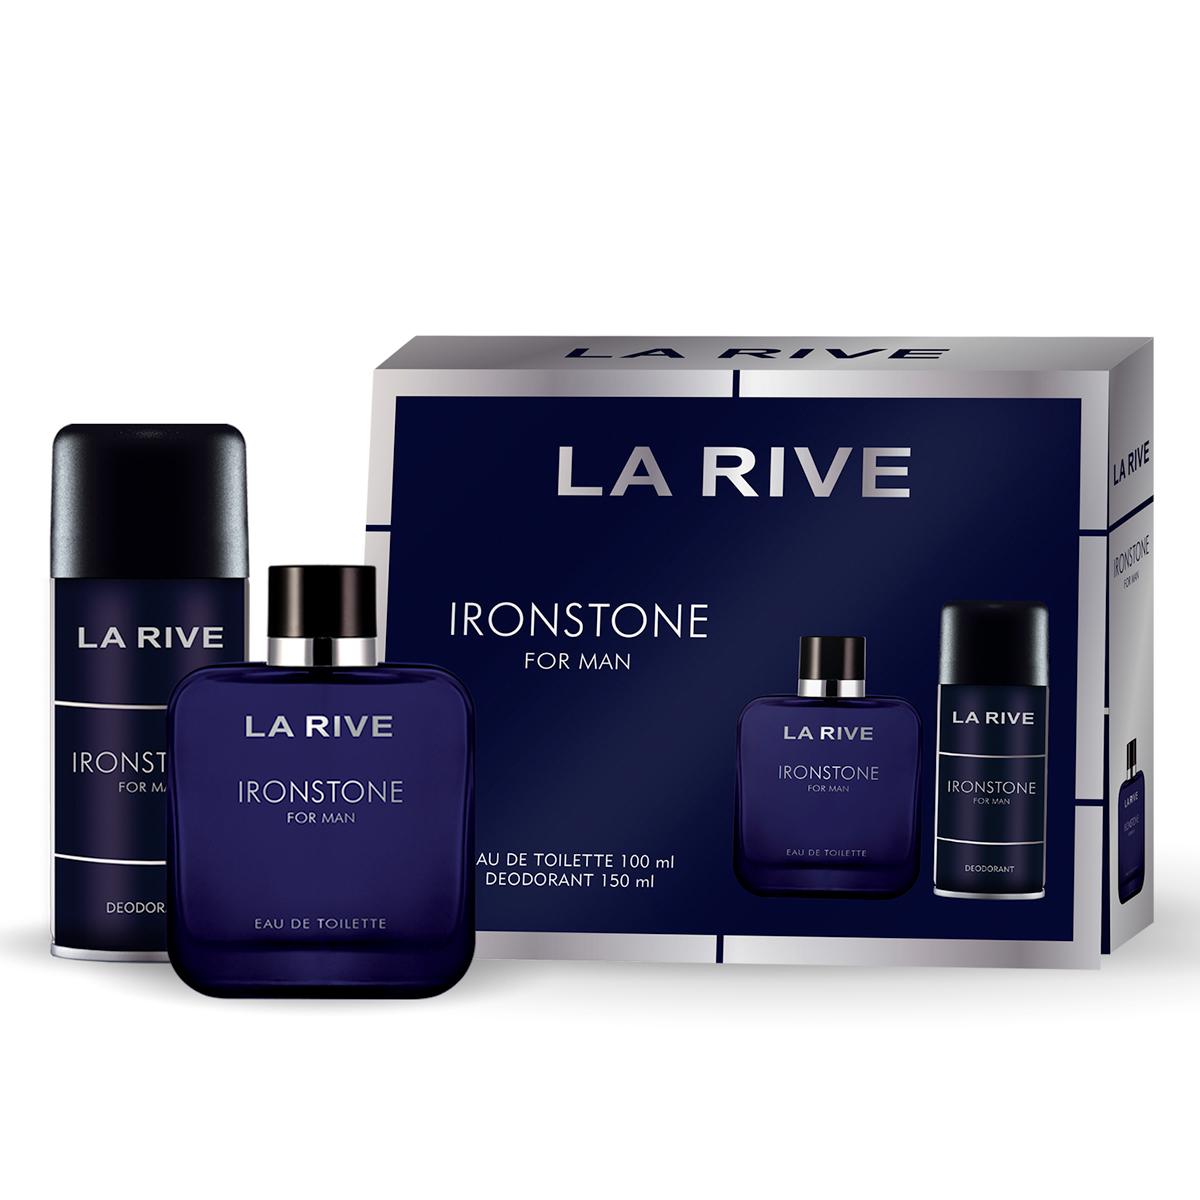 Kit Perfume Ironstone M 75ml + Desodorante 150ml La Rive